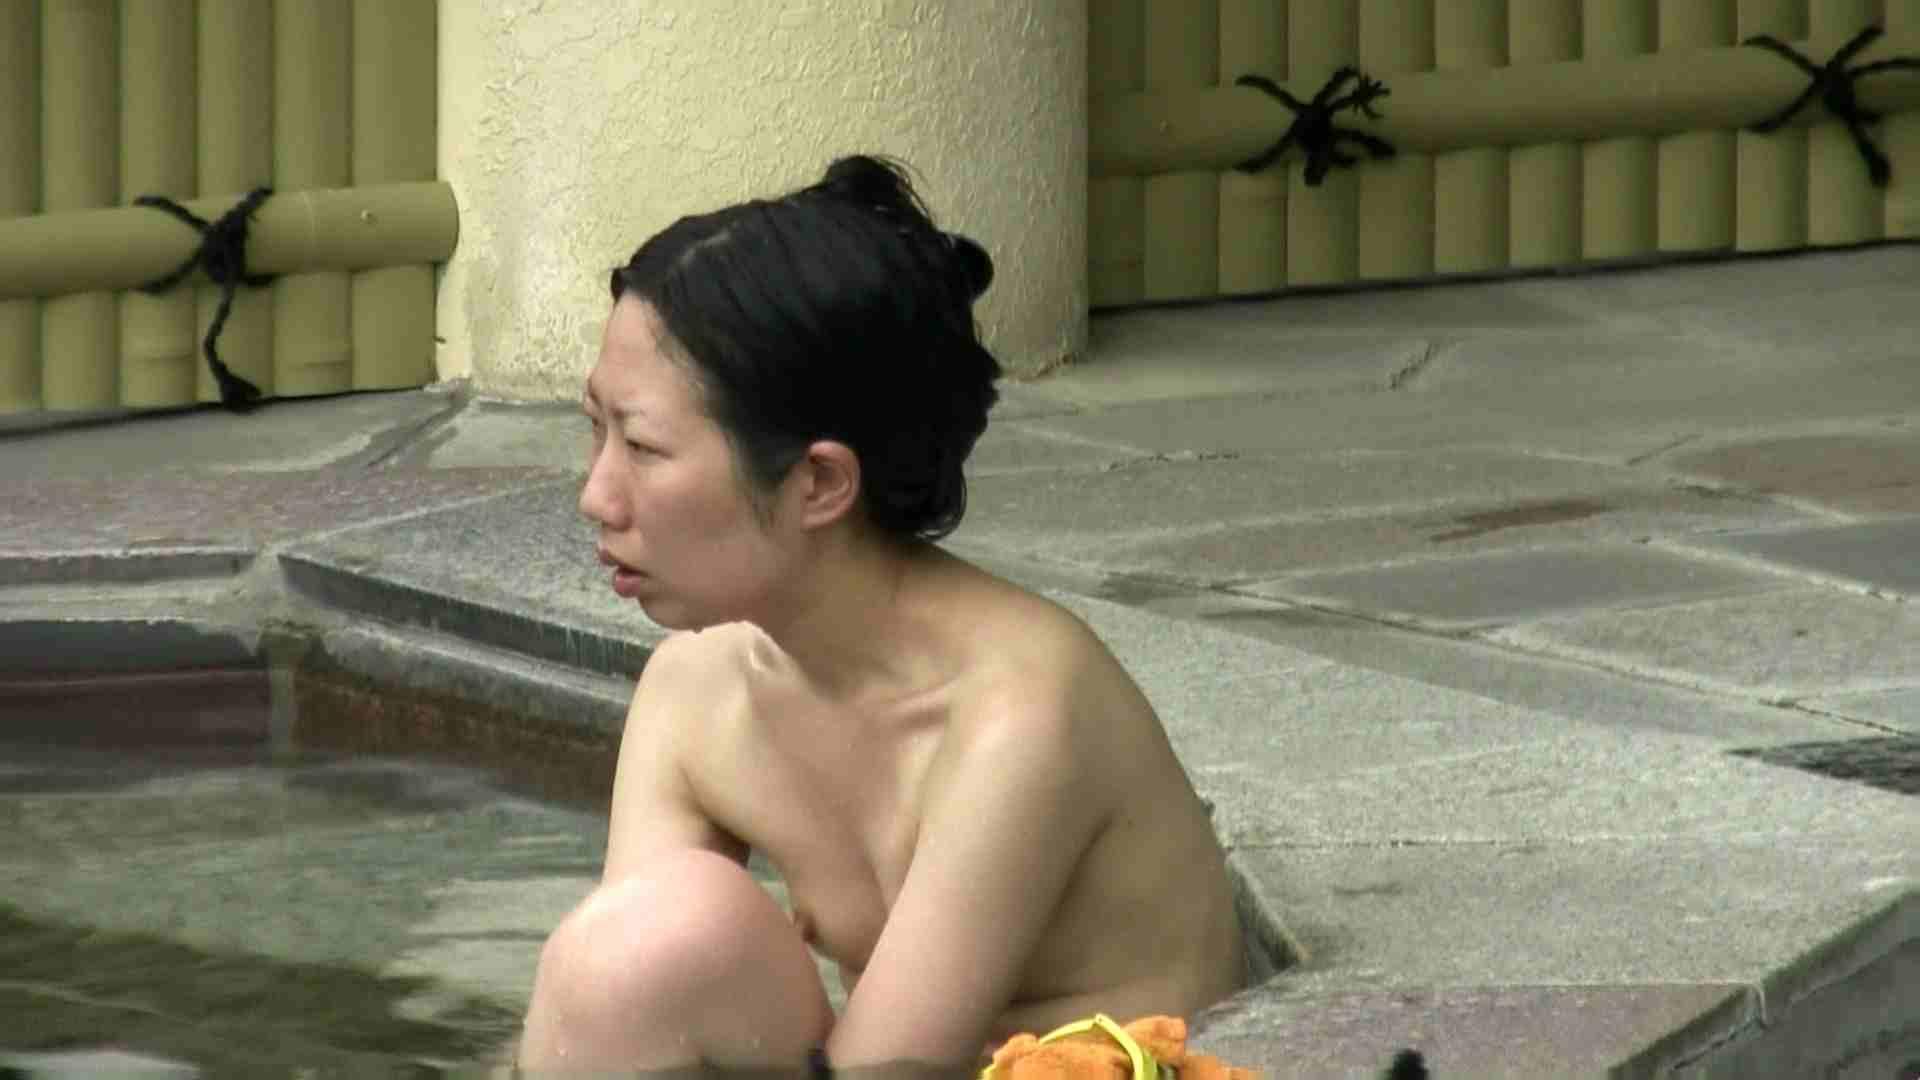 Aquaな露天風呂Vol.662 盗撮 性交動画流出 19連発 11